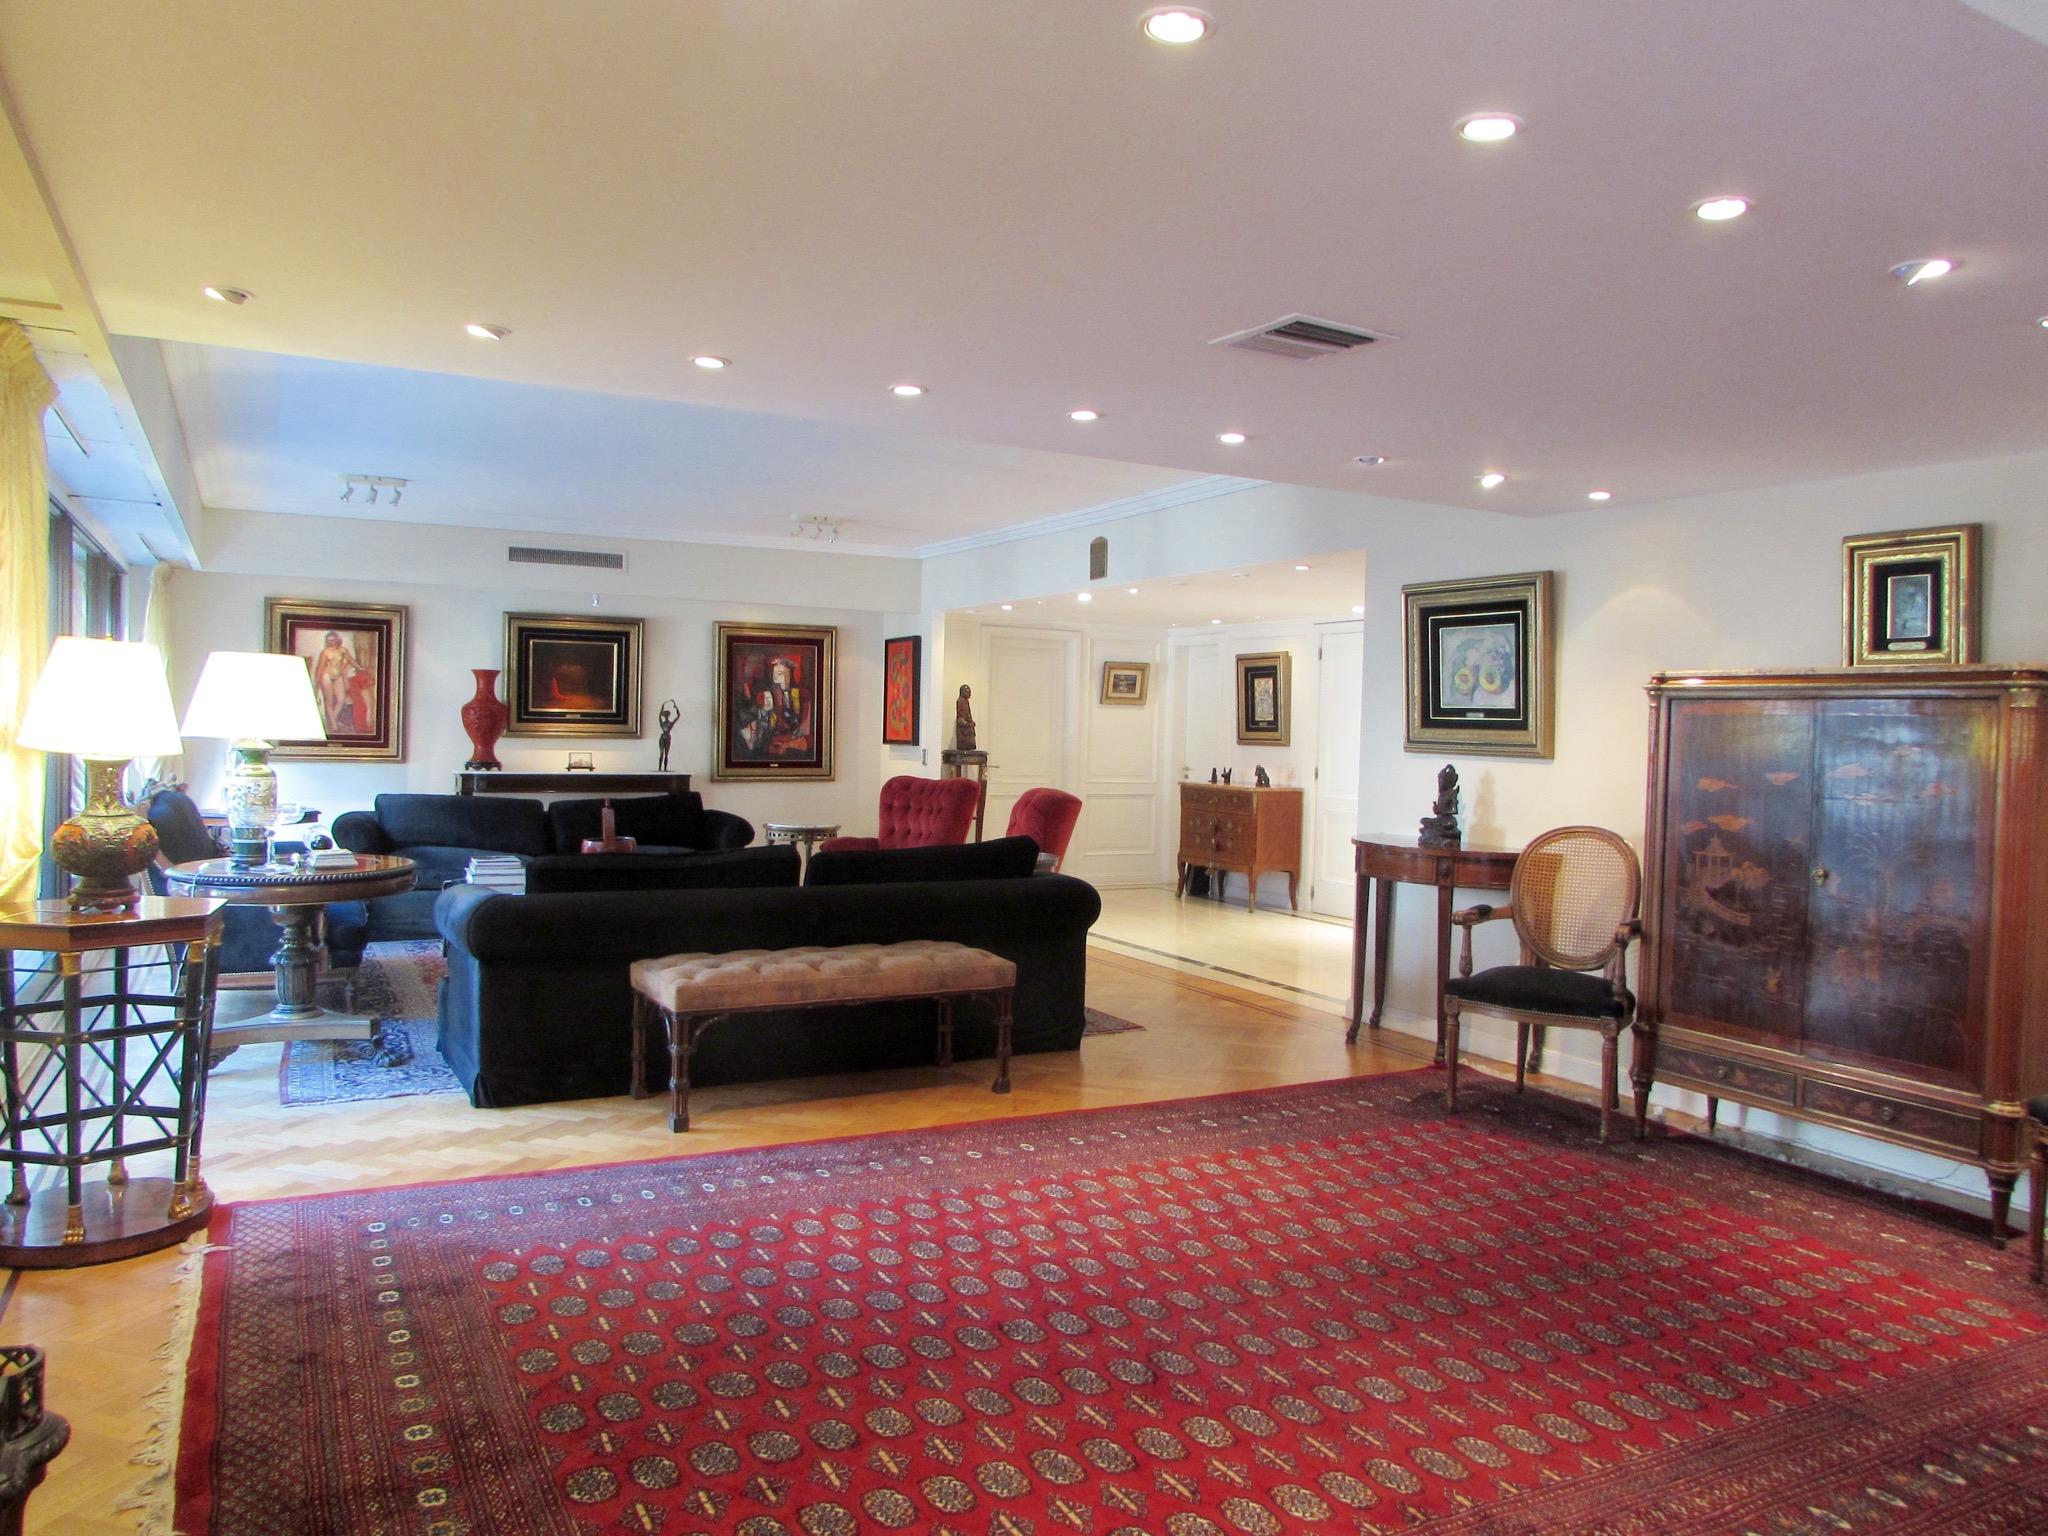 rentals property at Apartment in Recoleta - Av. Alvear 1500